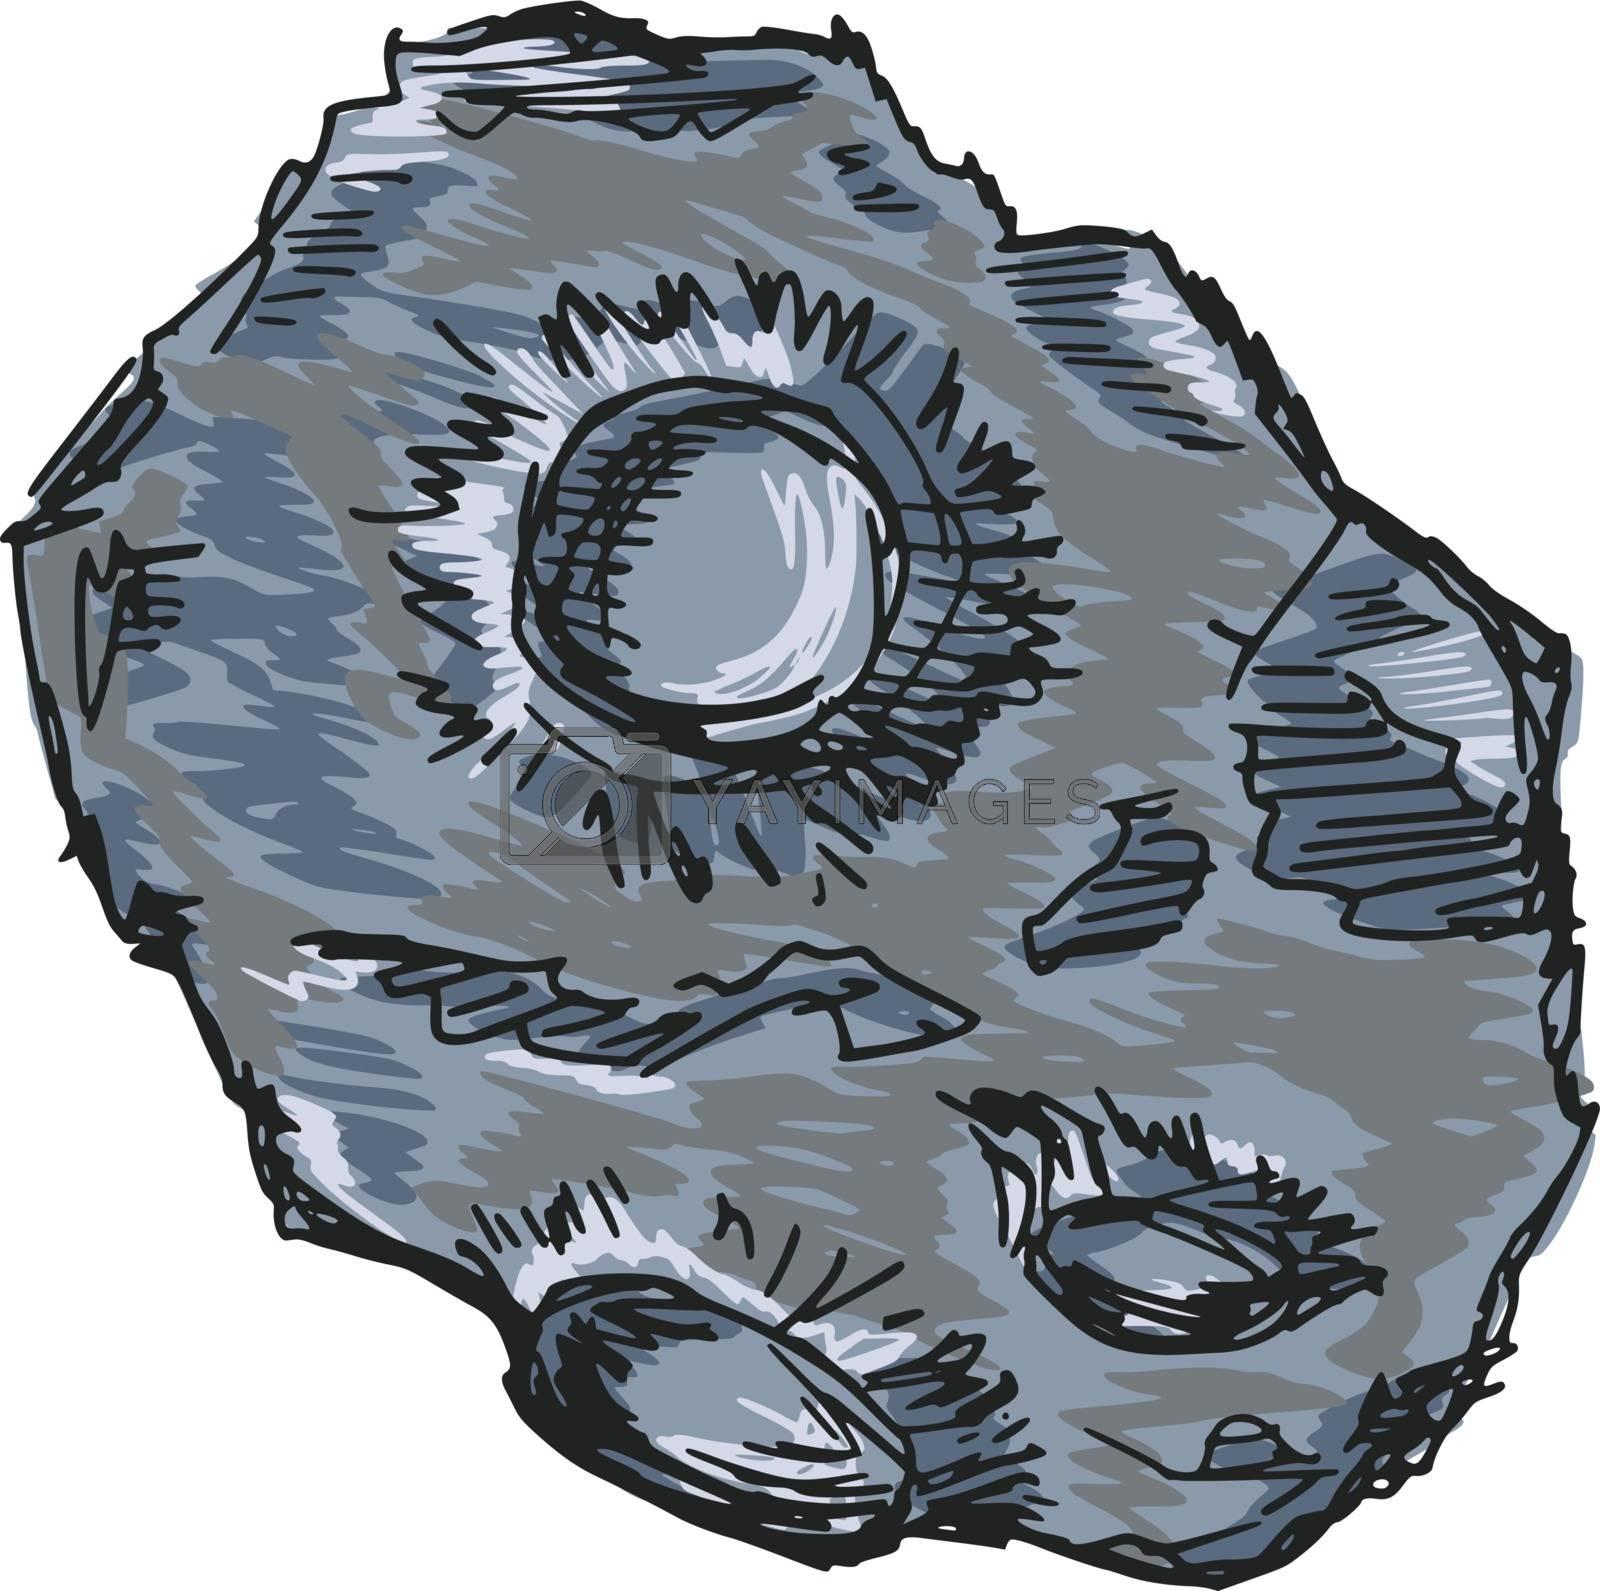 hand drawn, sketch, cartoon illustration of asteroid